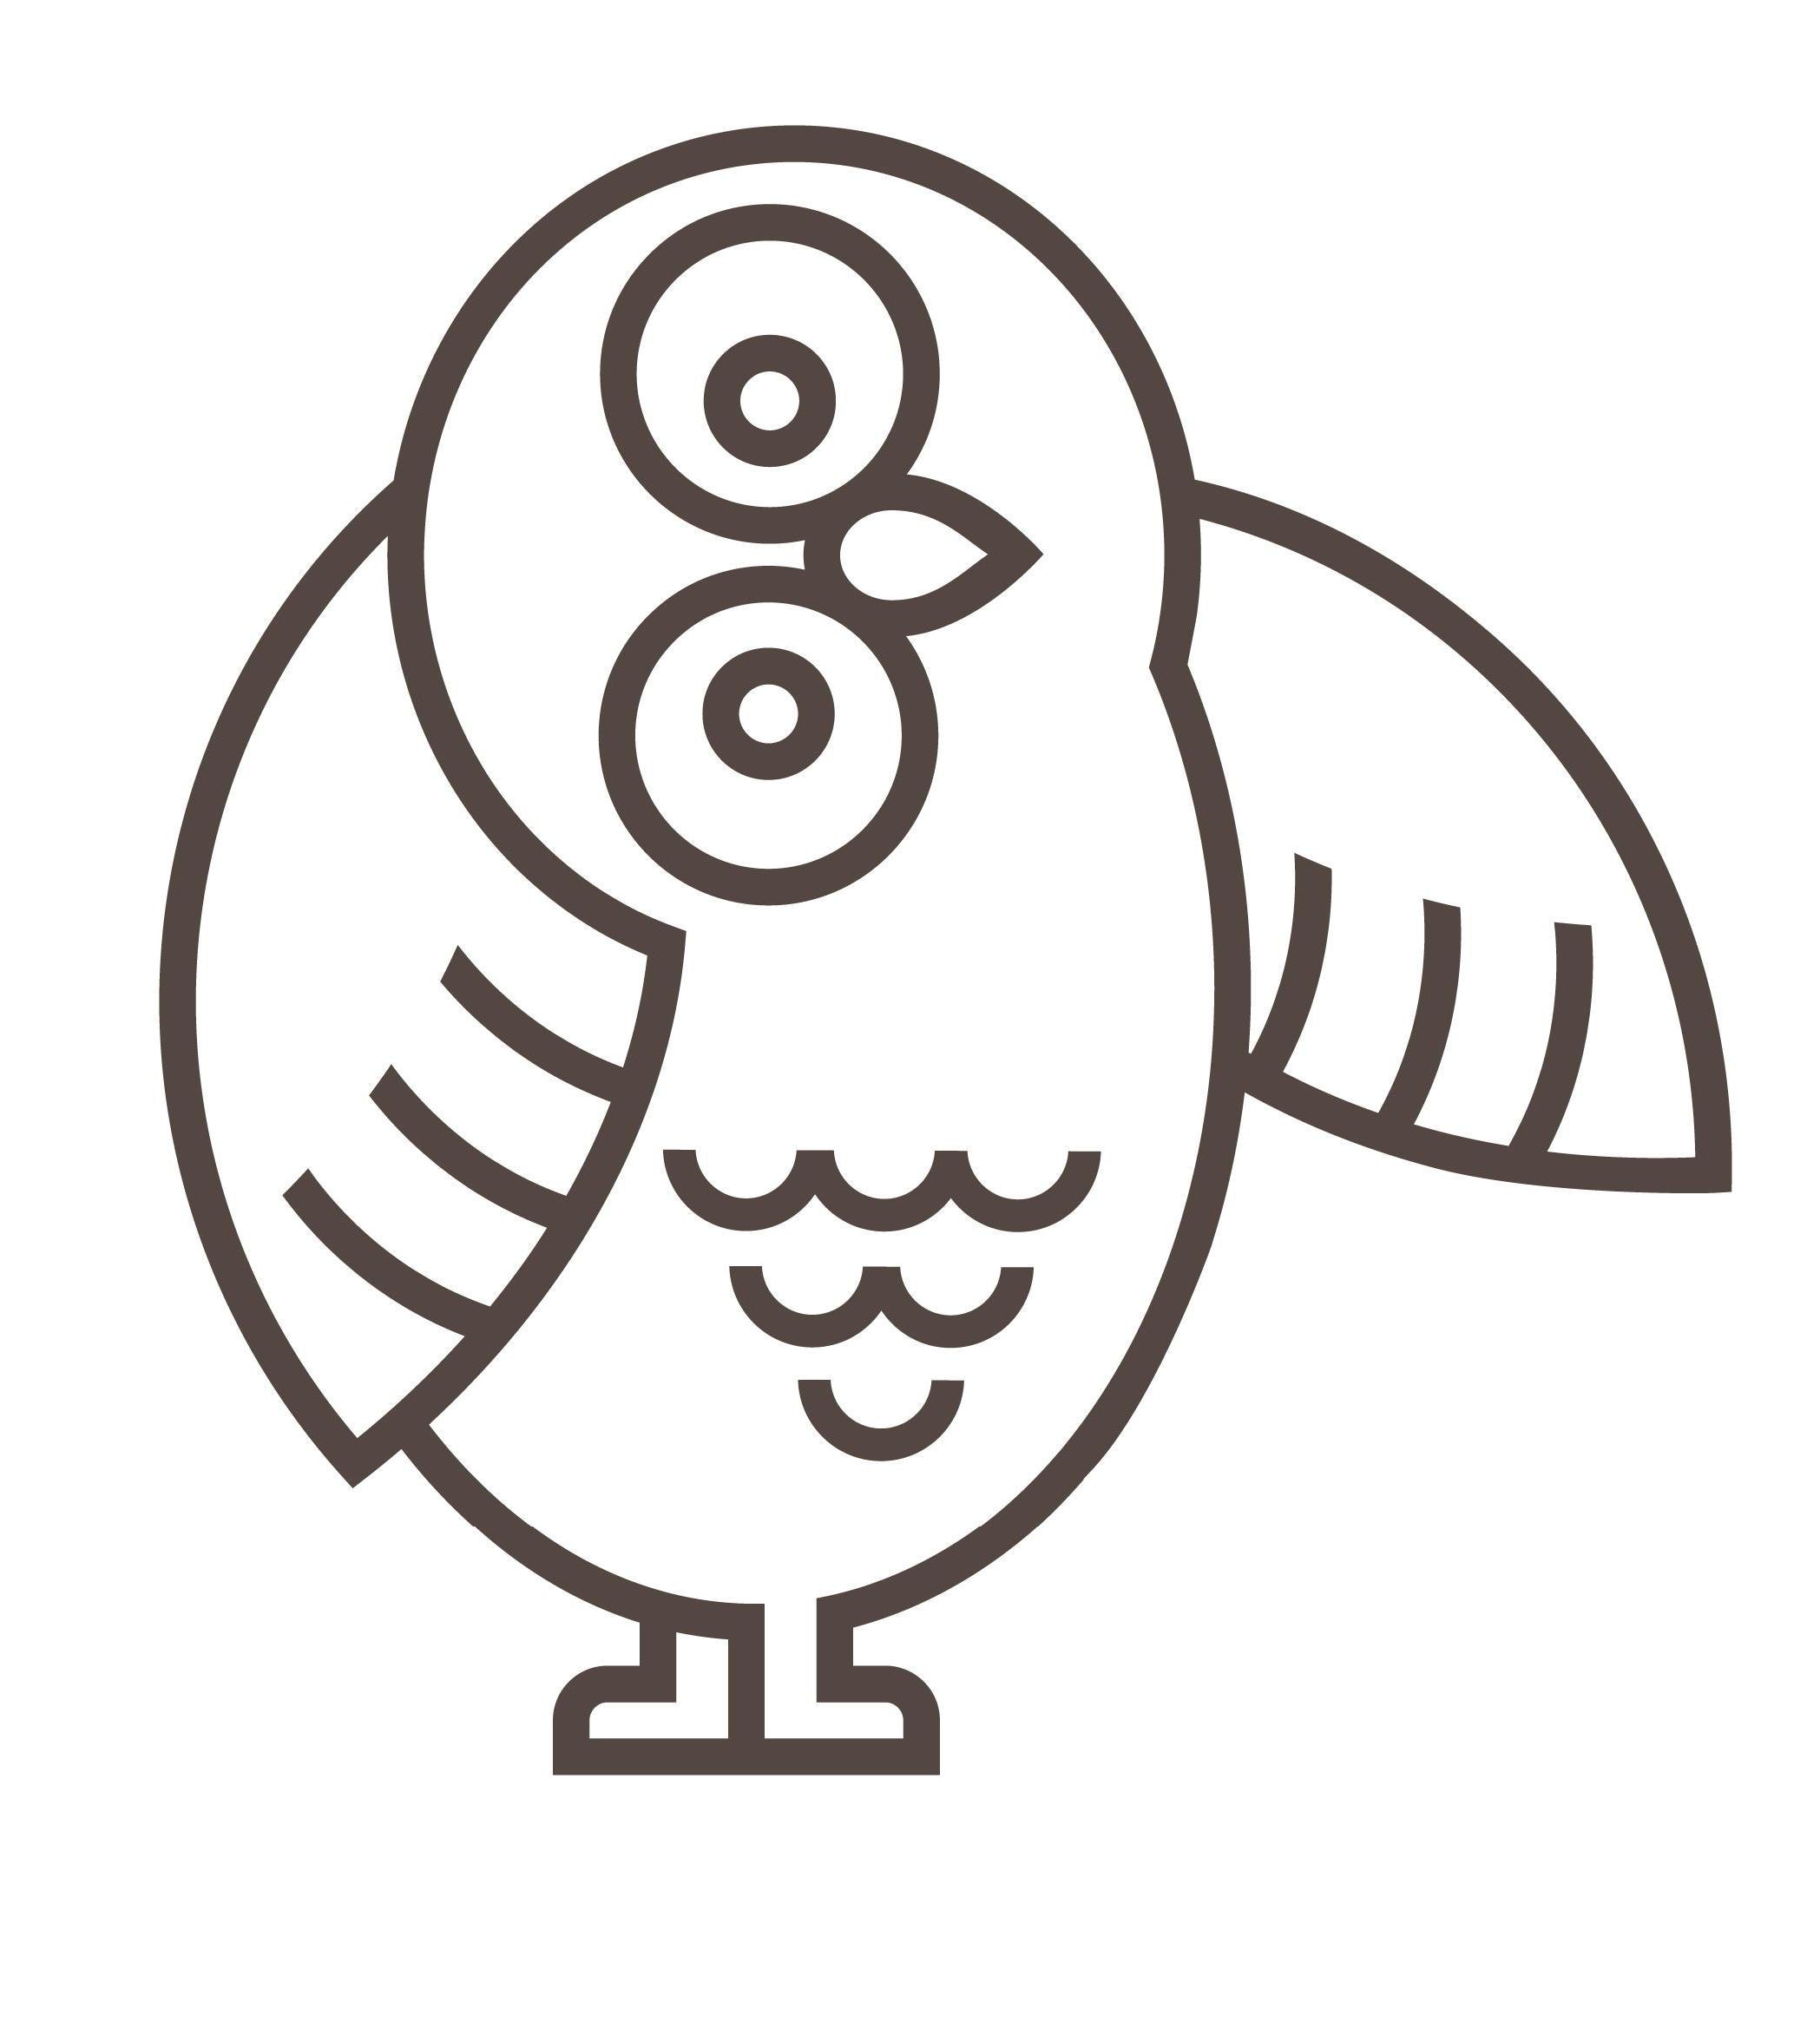 Mascot Owl Left Wing Extended